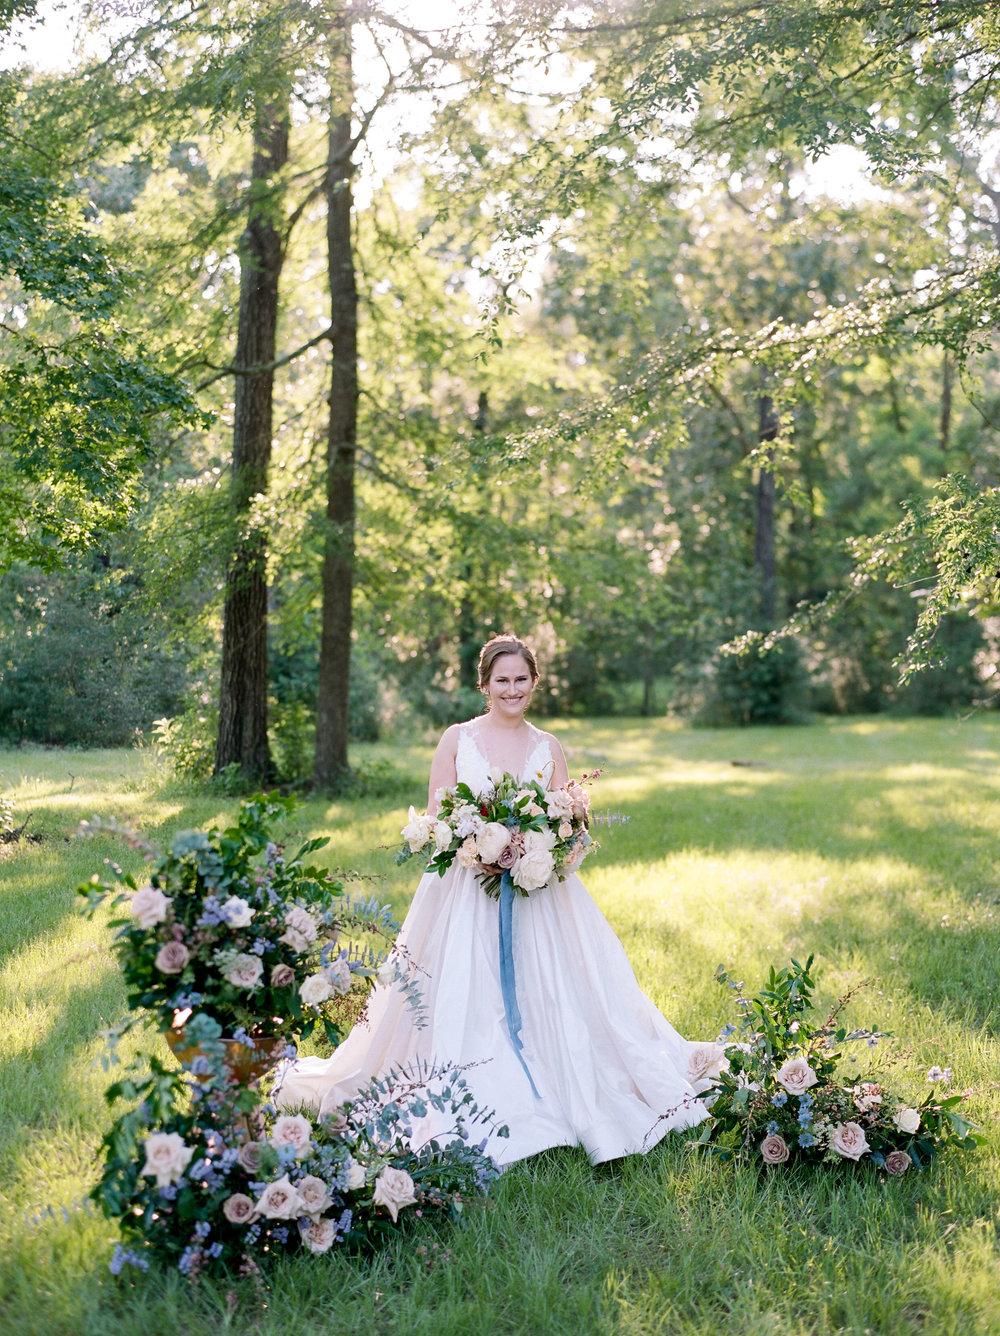 Houston-Fine-Art-Film-Destination-Wedding-Photographer-Top-Best-Luxury-Josh-Dana-Fernandez-Photographer-Austin-Texas-5.jpg